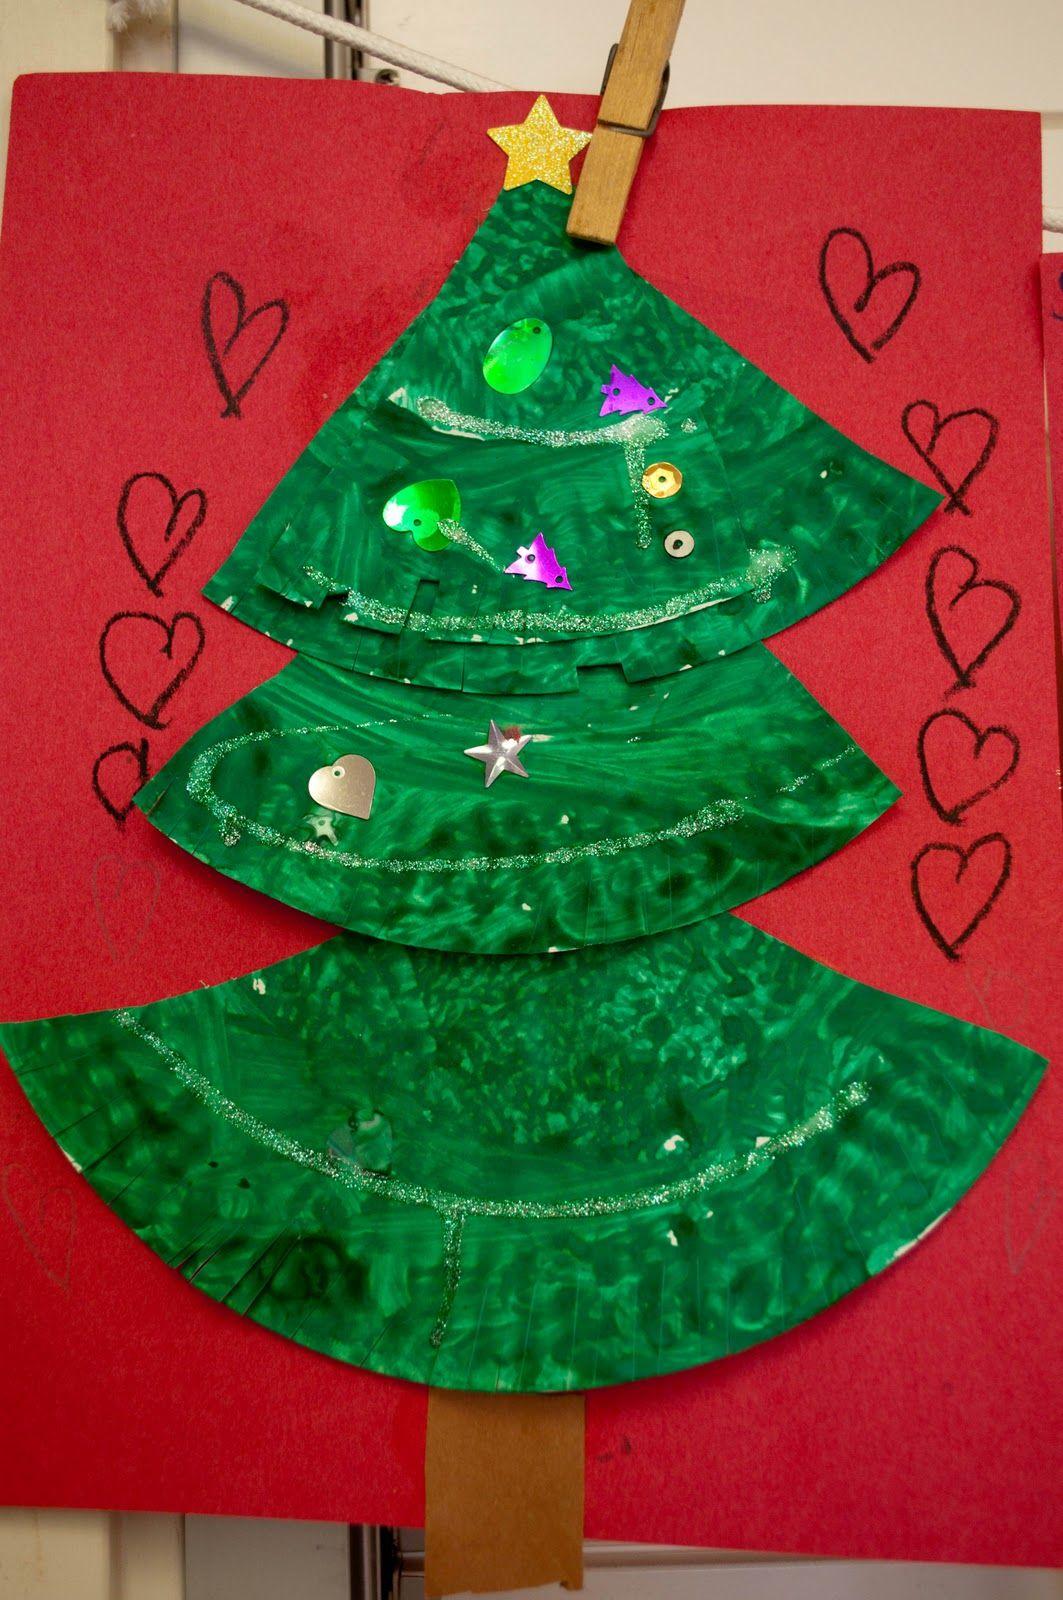 Christmas Tree Craft Ideas For Preschoolers Part - 32: Christmas Tree Craft With Paper Plates · Kindergarten ProjectsKindergarten  ...